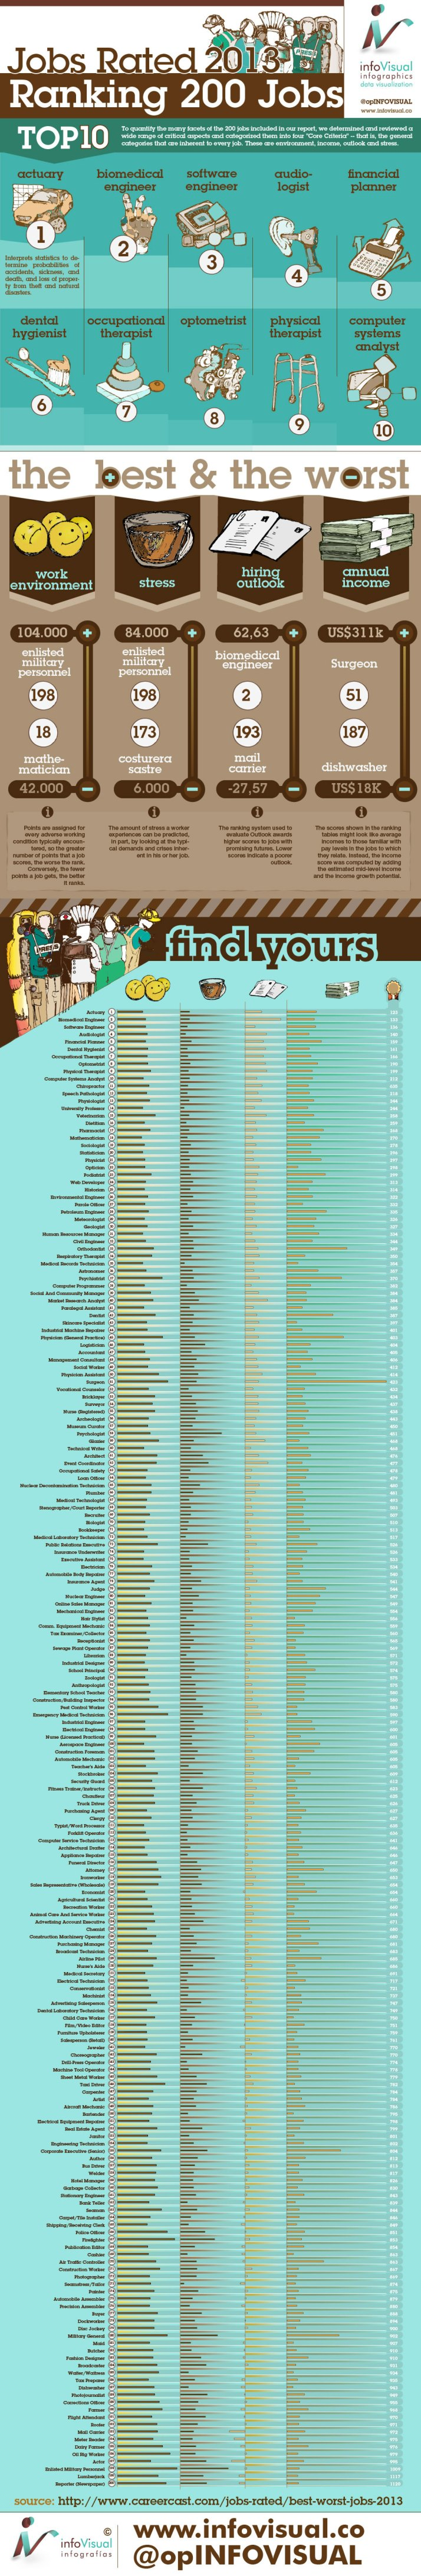 Jobs Rated 2013 (Ranking 200 Jobs) 2013 (USA) #infografia #infographic